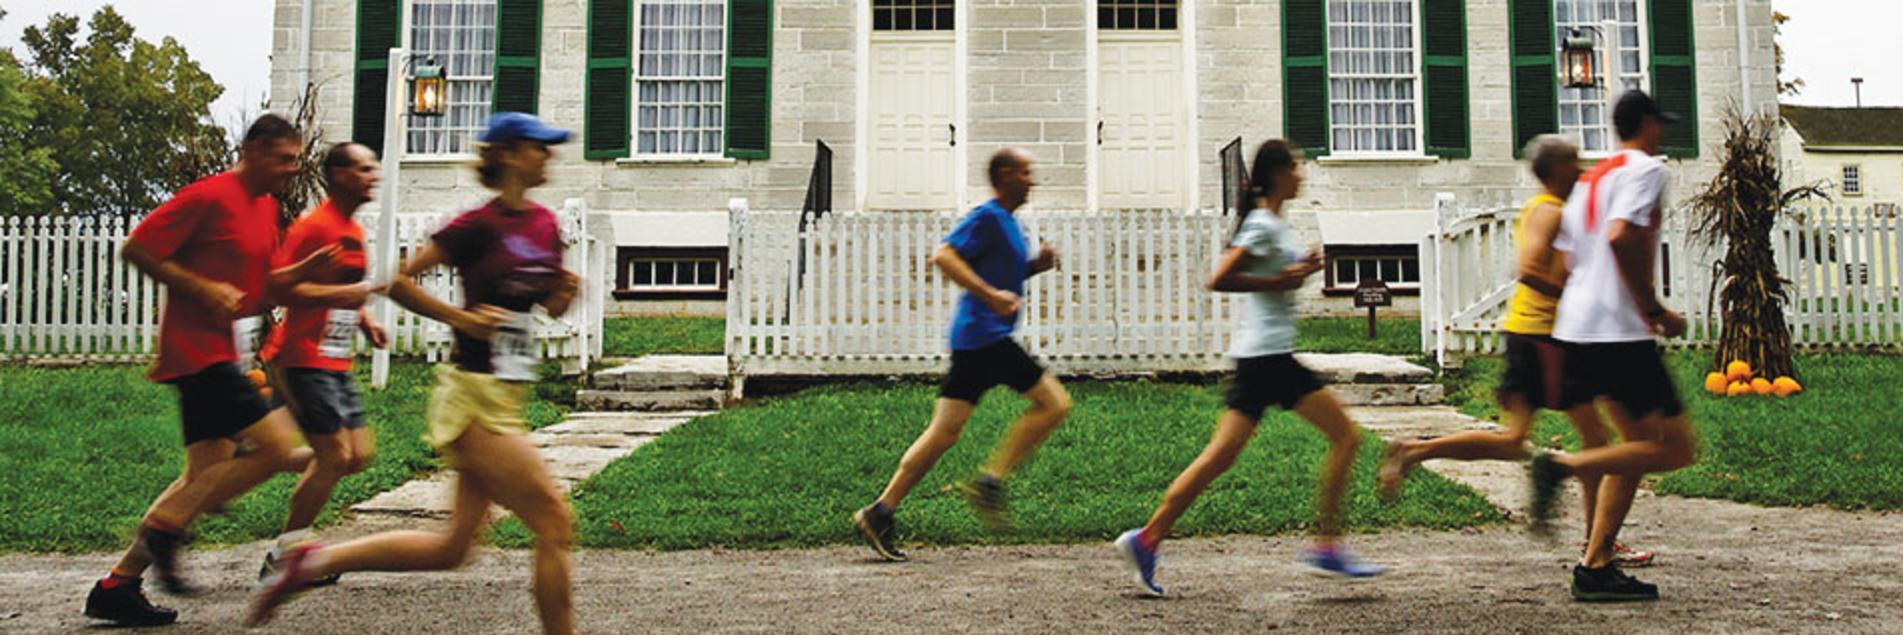 Unpleasant Run at Shaker Village